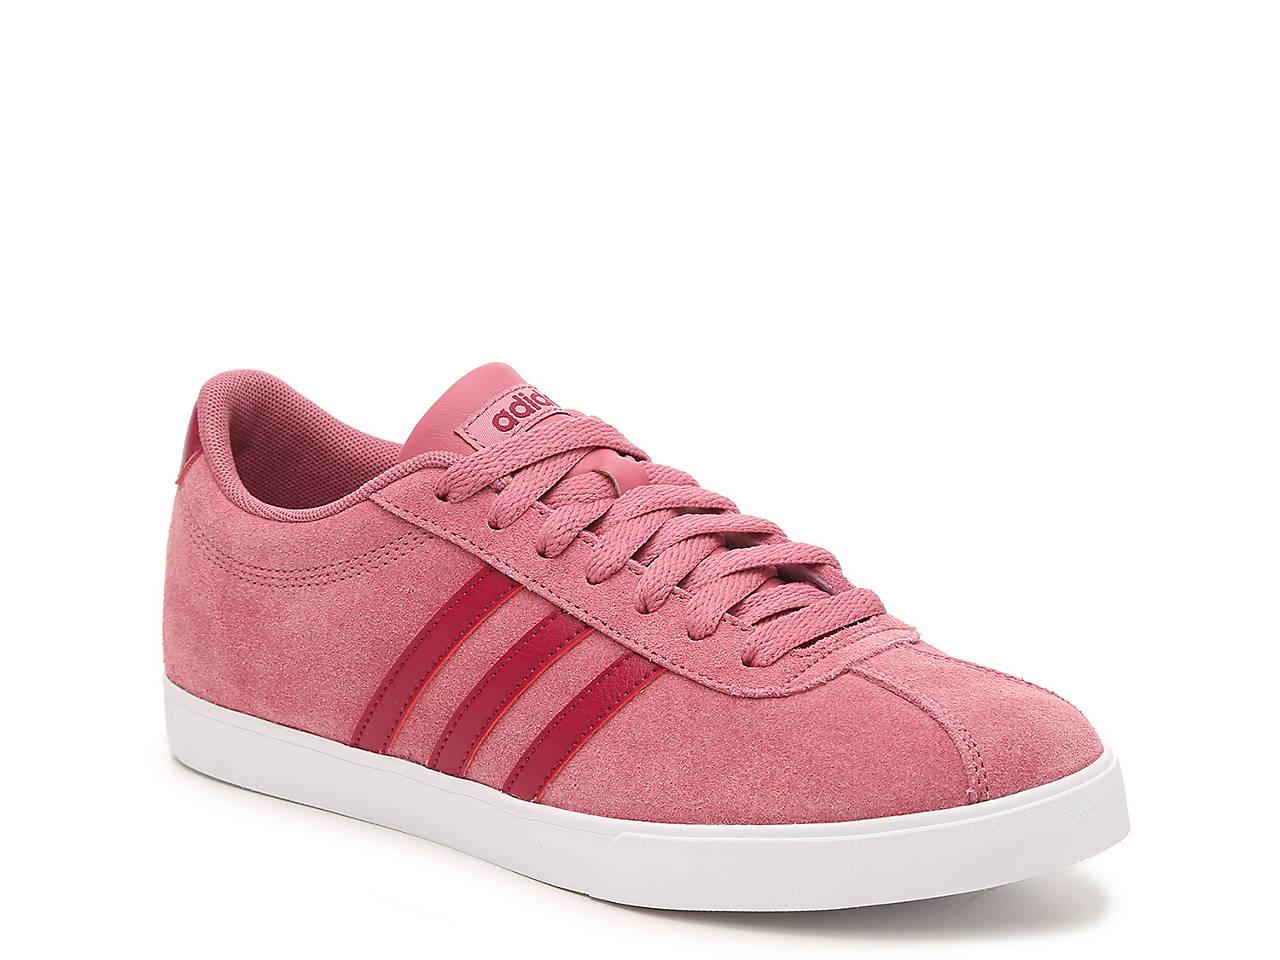 adidas Courtset Sneaker - Women s Women s Shoes  f4fa3309f